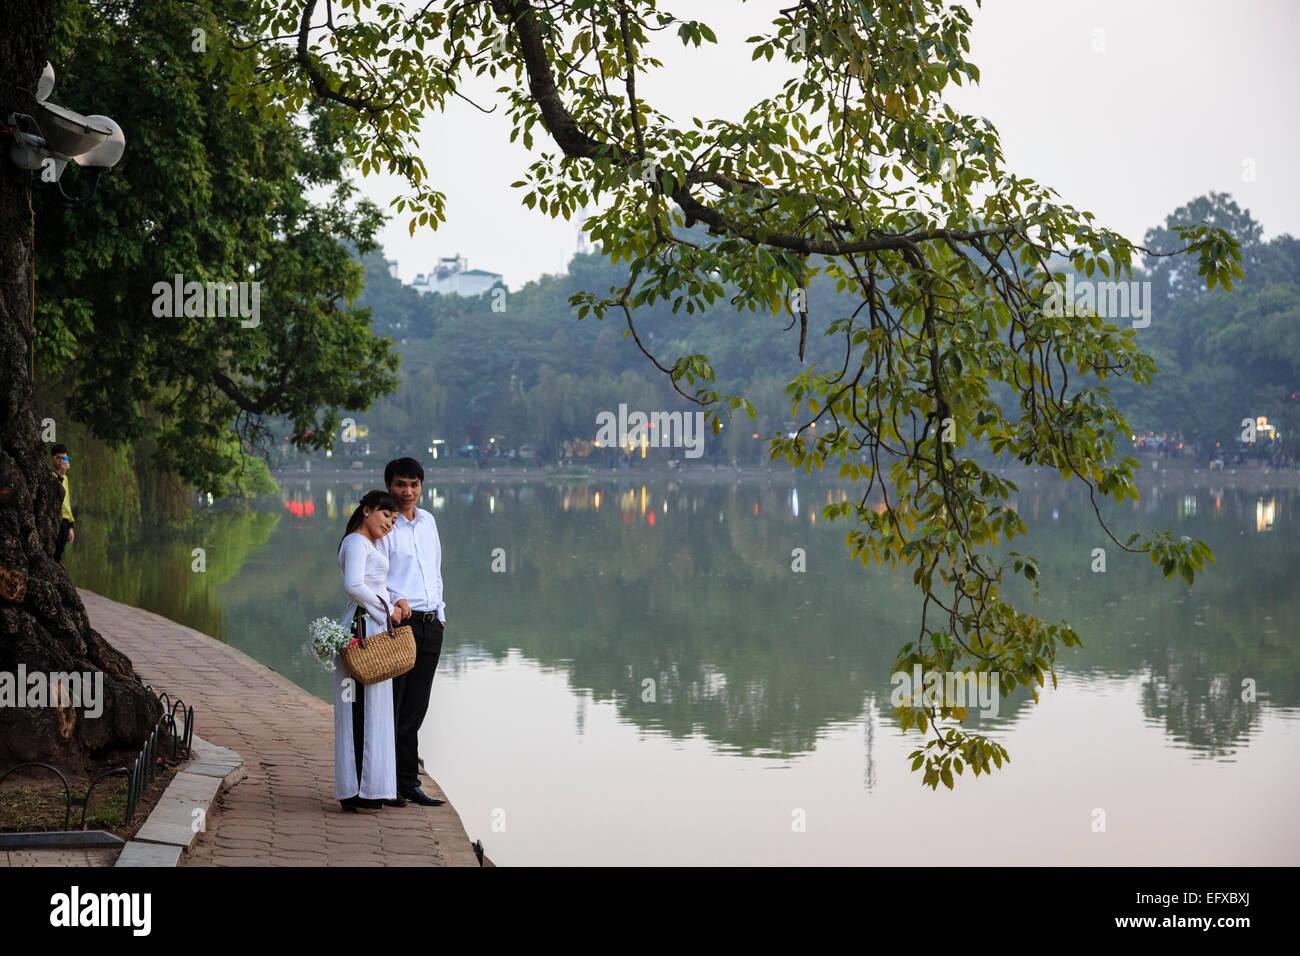 Couple at the Hoan Kiem Lake in the old quarter, Hanoi, Vietnam. - Stock Image